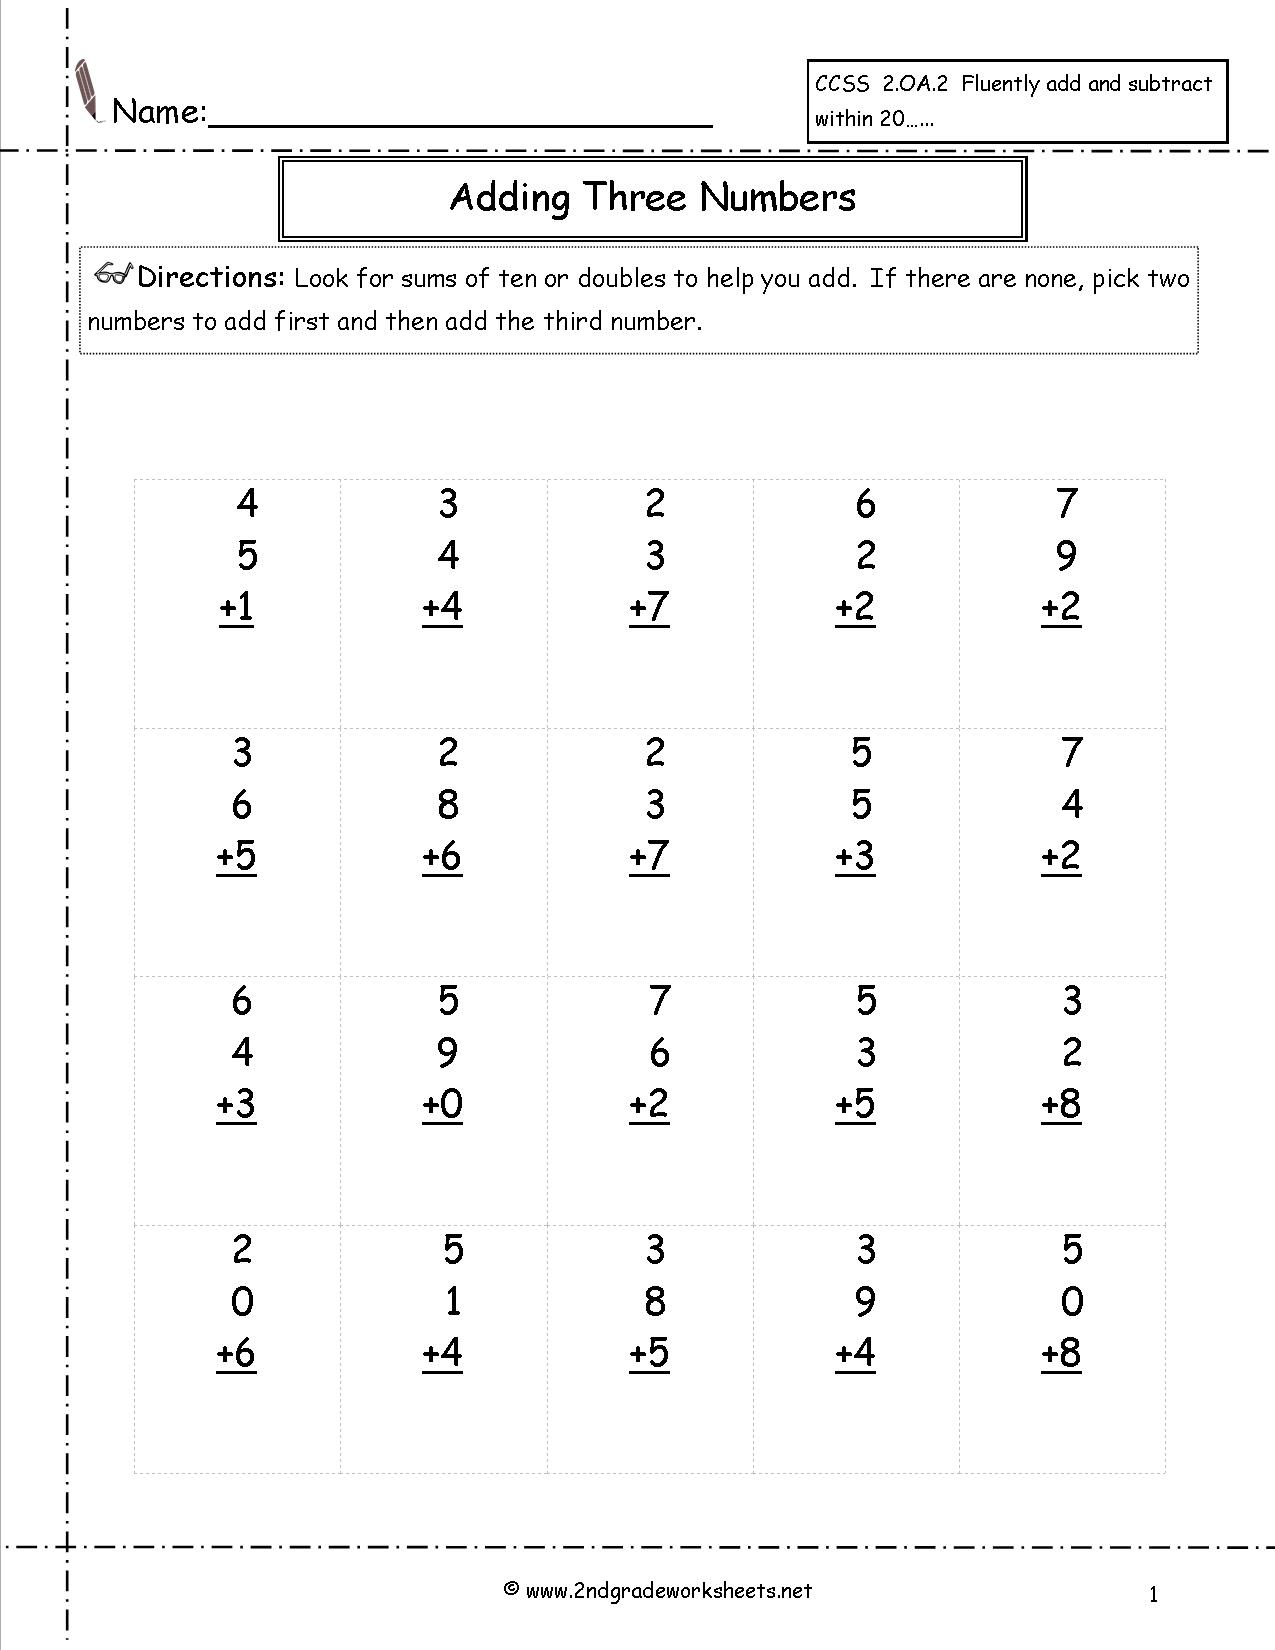 Free Math Worksheets And Printouts   Printable Second Grade Math Worksheets